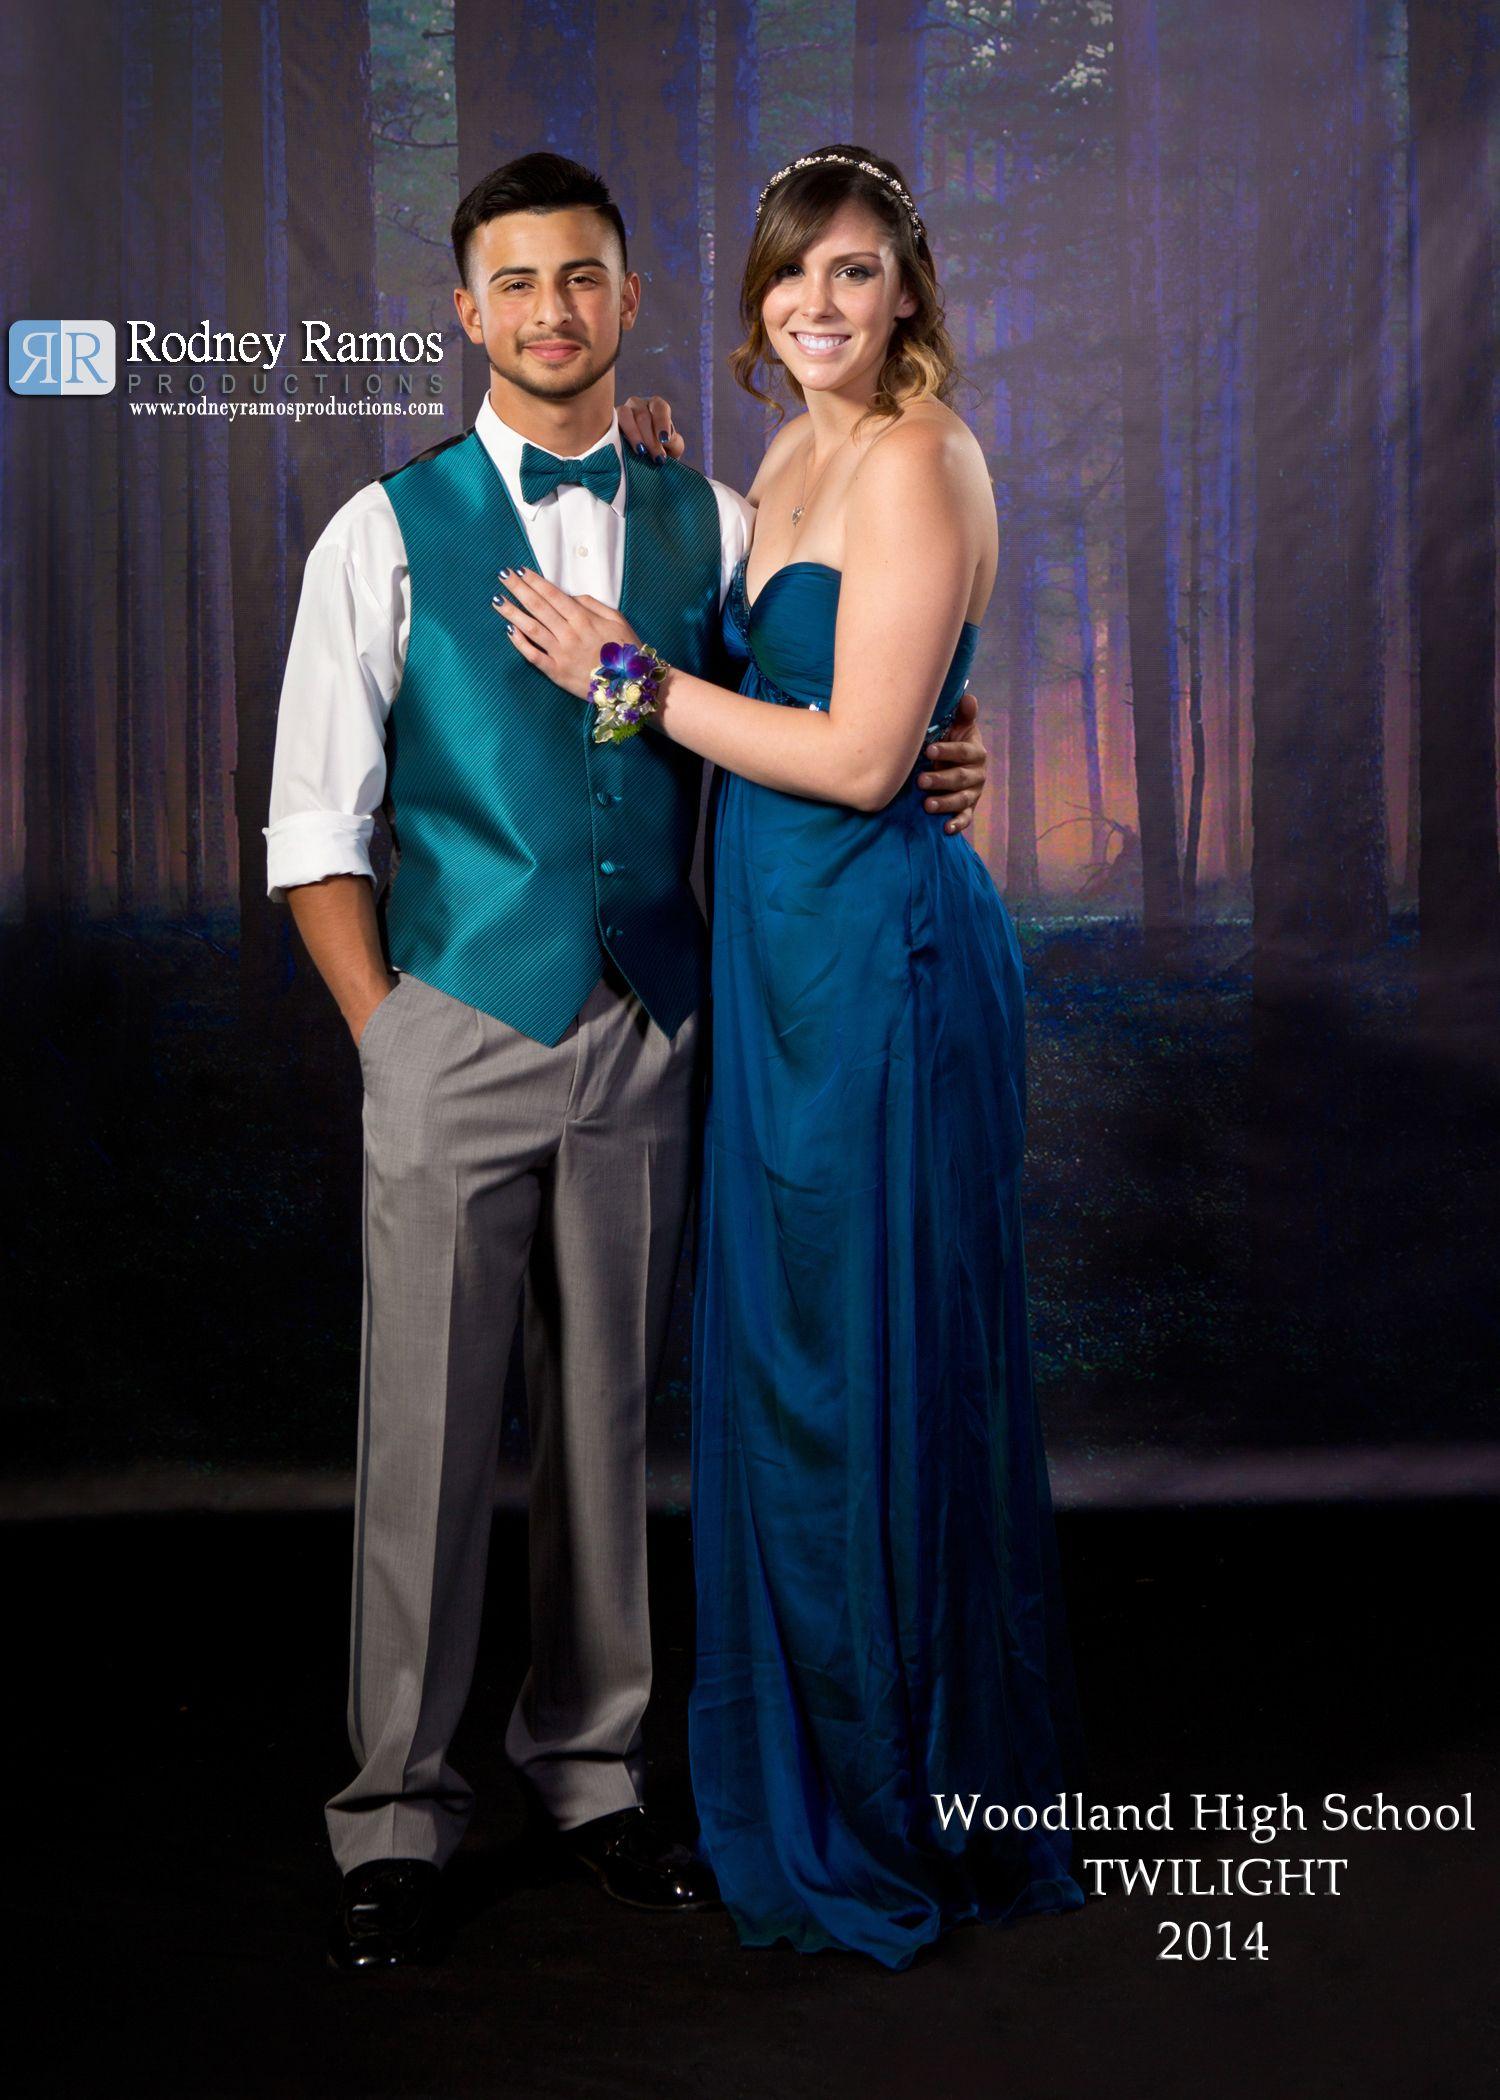 Woodland High School 2014 Twilight Prom Photo Styling By Rodney Ramos Productions C 2014 Rodneyramosproductions Rodneyra Prom Photos Woodland High School Prom [ 2100 x 1500 Pixel ]